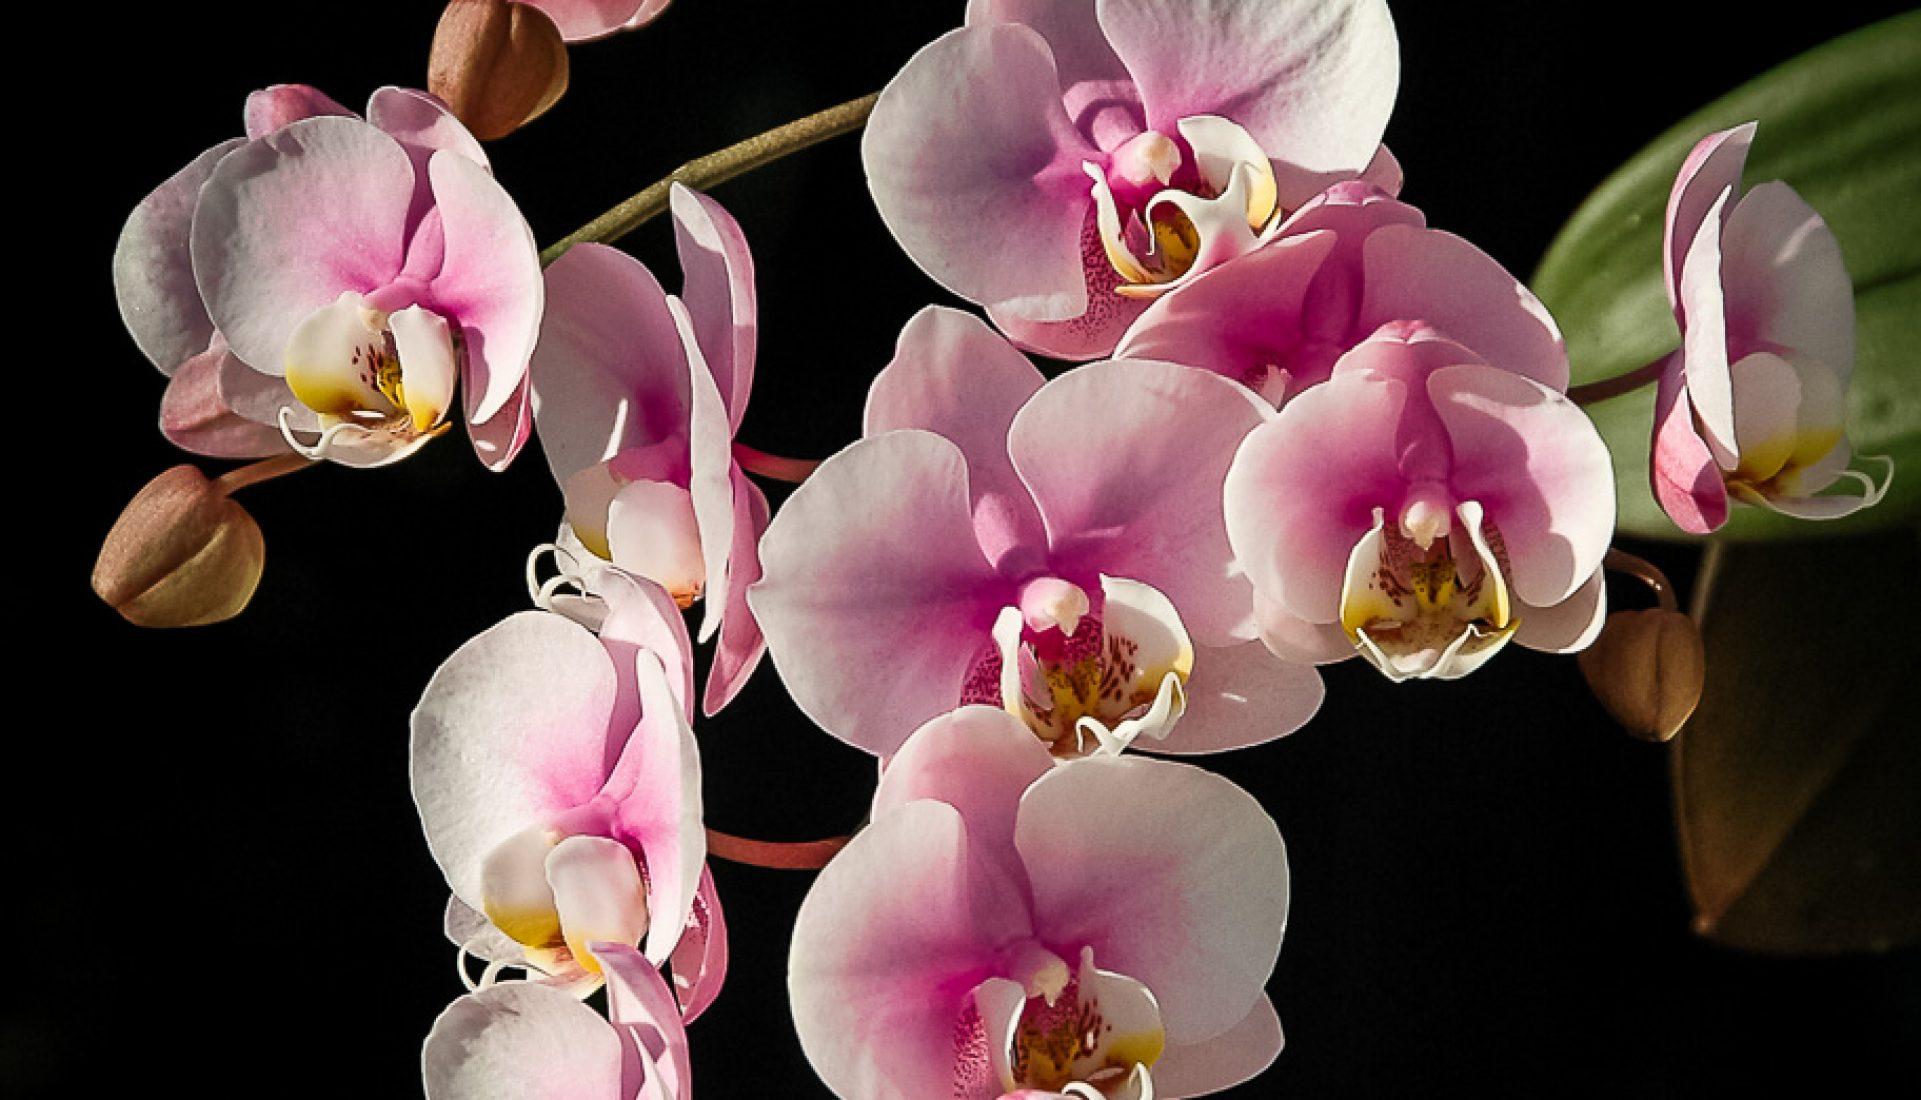 A Single Bloom – a Single Image (2)